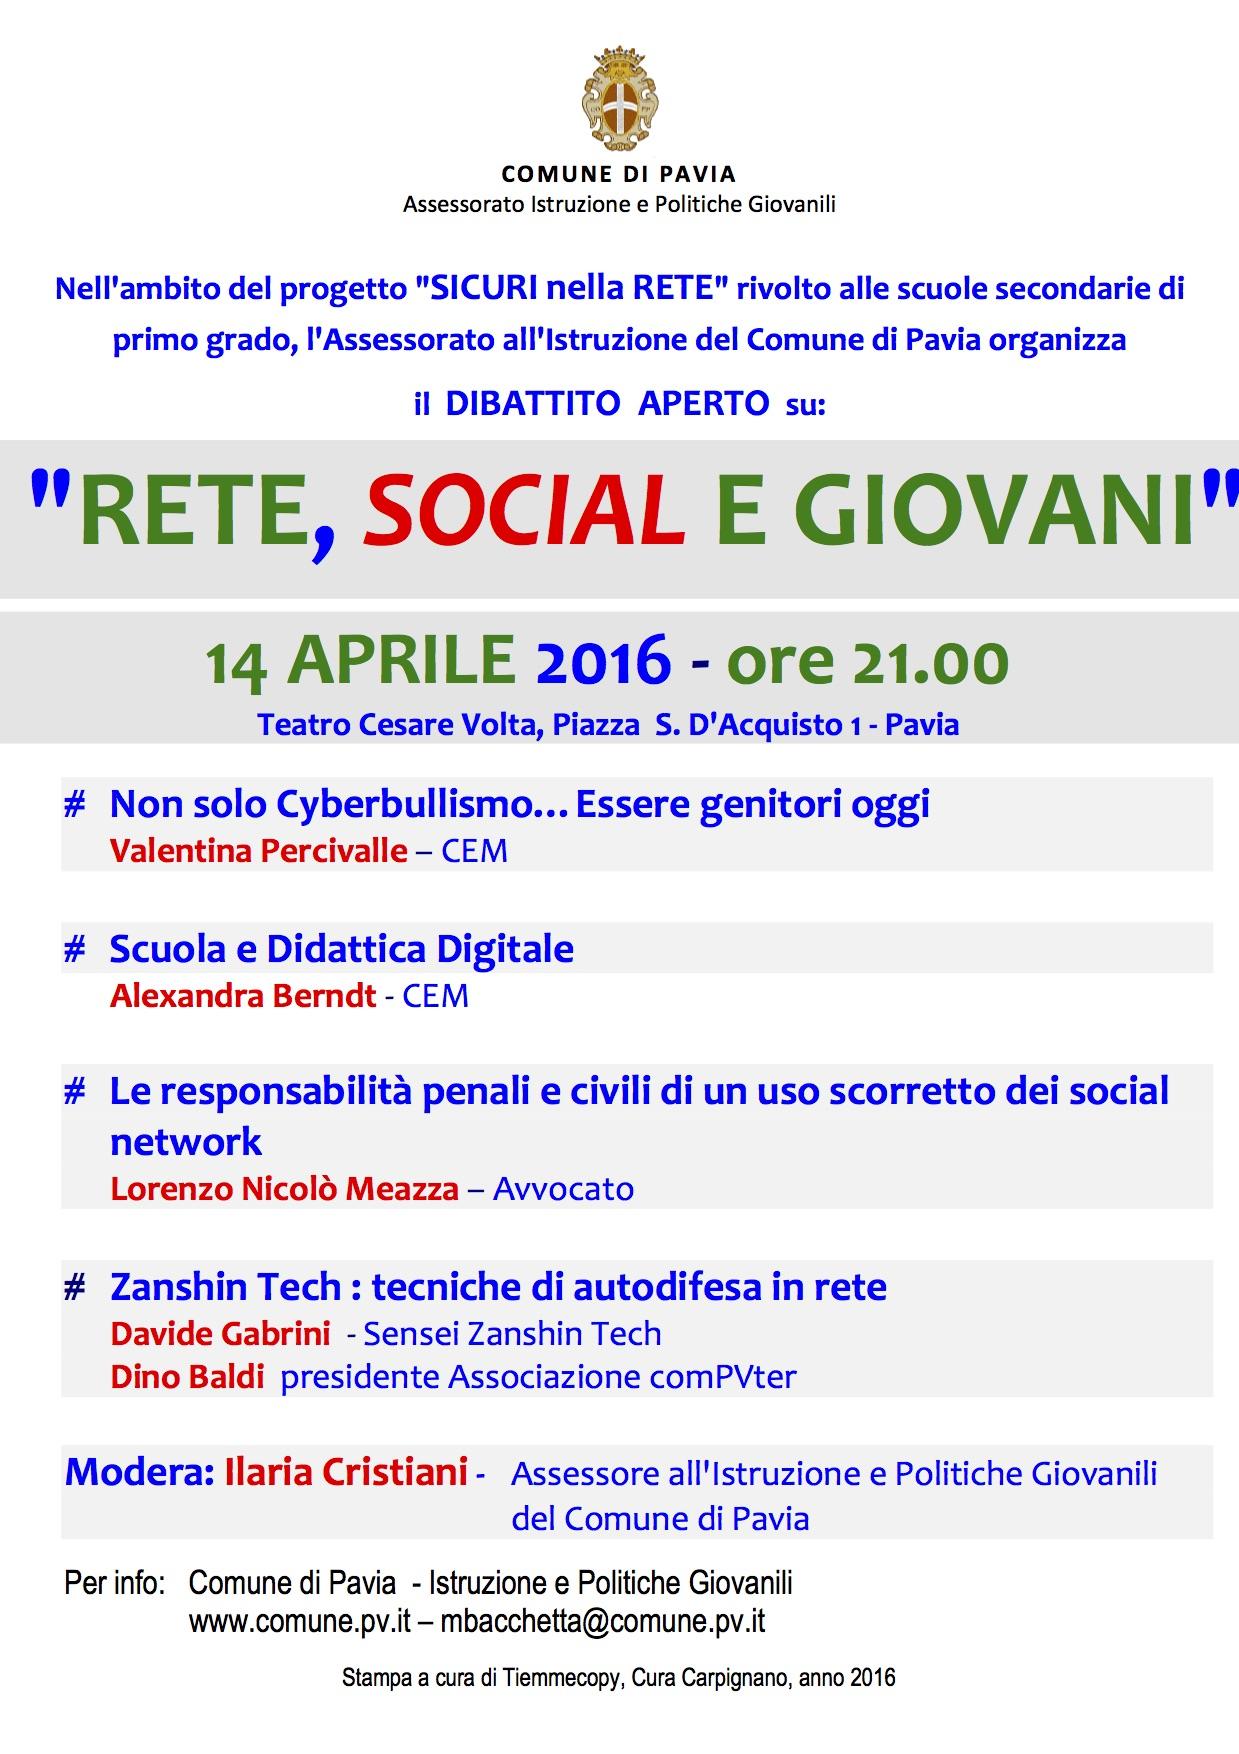 Locandina 14 aprile 2016_SicurinellaRETE_A3